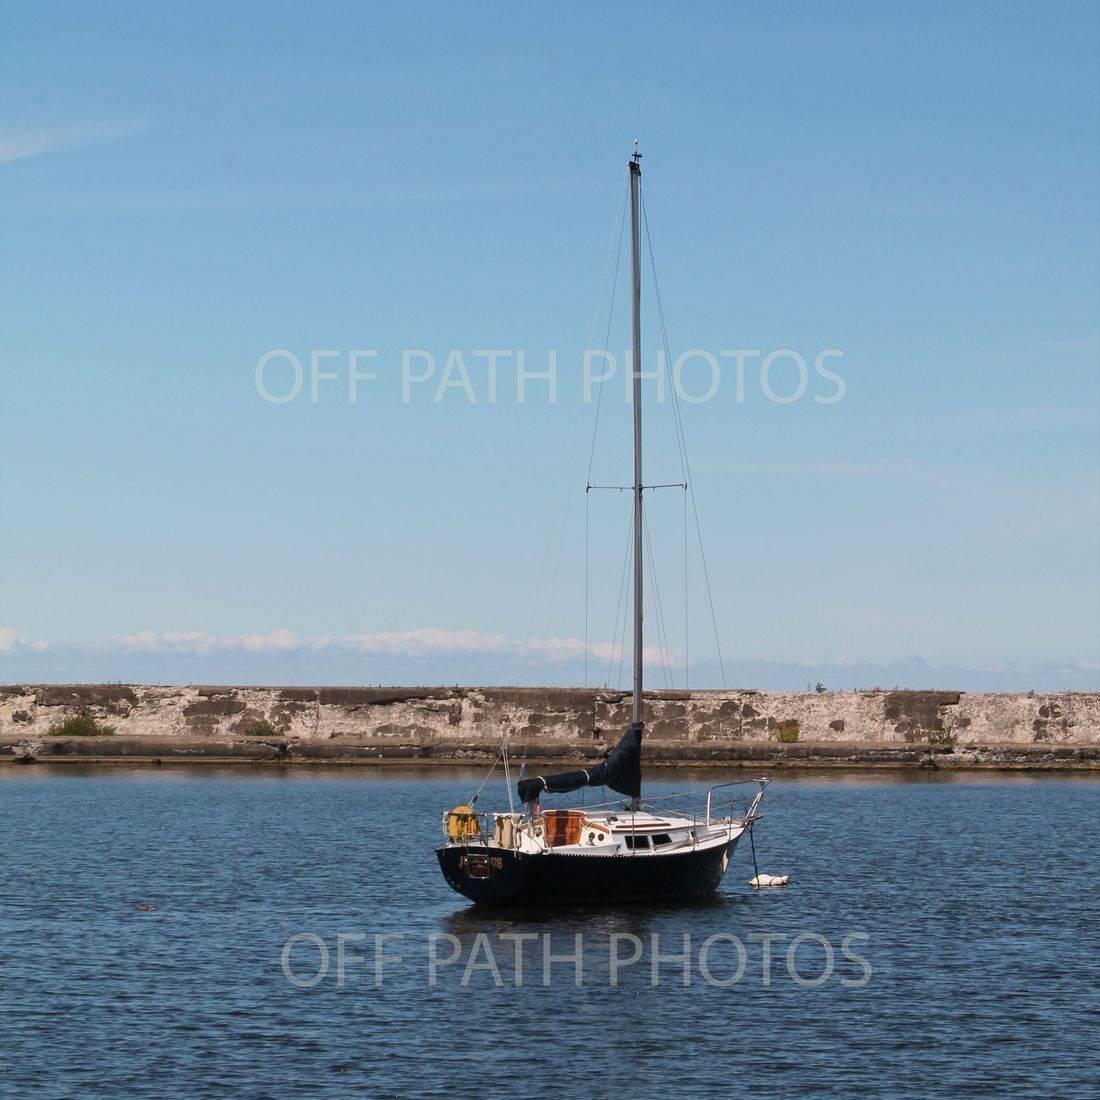 photography, Lake Ontario, sail boat, summer, water, break wall, Oswego